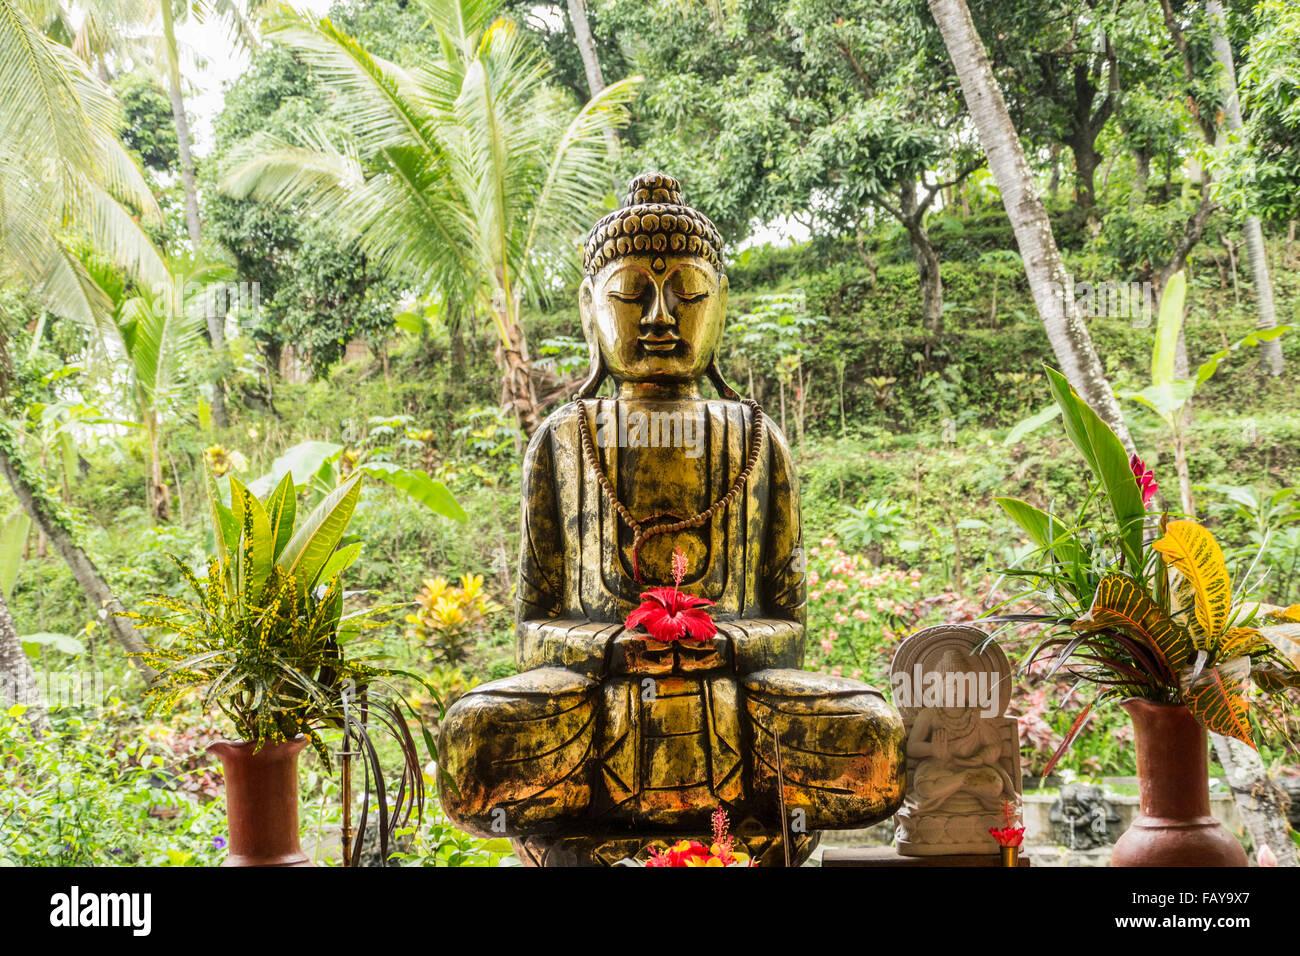 Indonesien, Tejakula, Bali, Hibiskusblüten auf Buddha-statue Stockbild